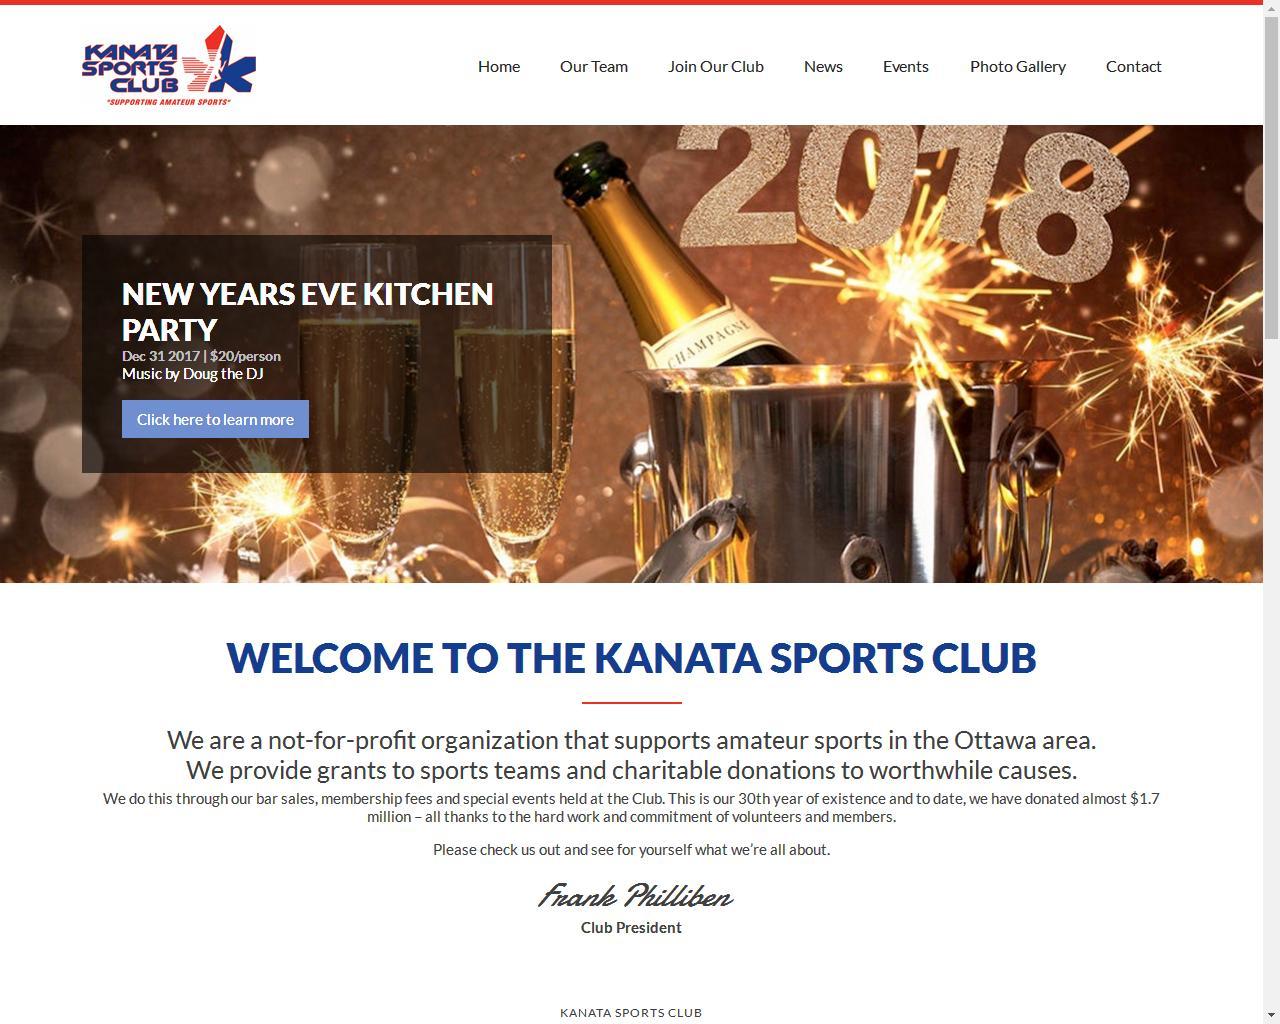 Kanata Sports Club